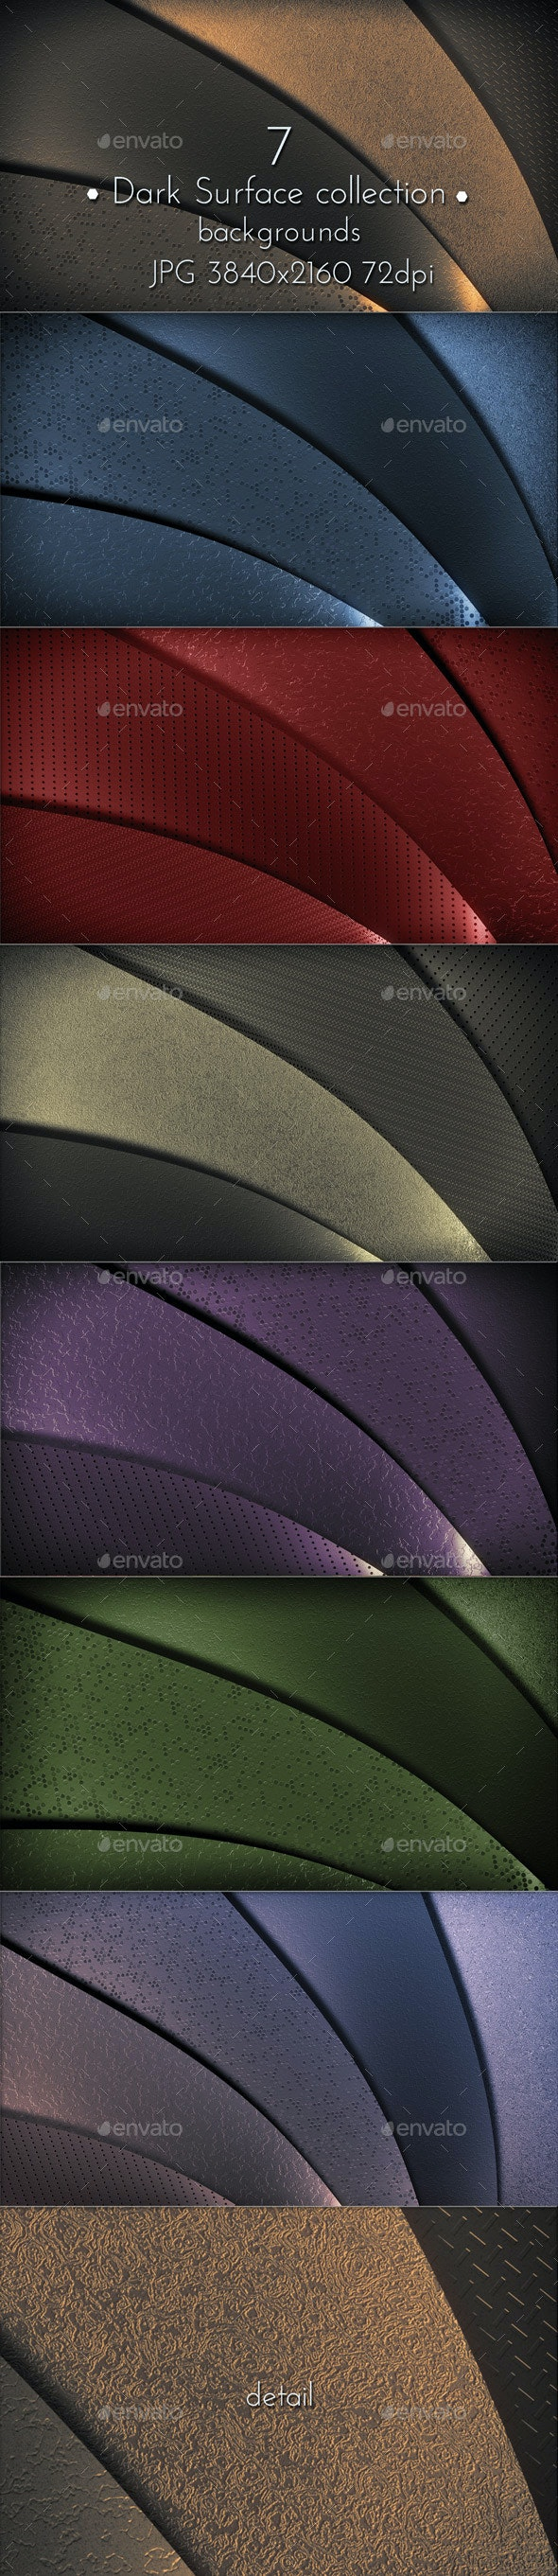 Dark Blades Background - Tech / Futuristic Backgrounds